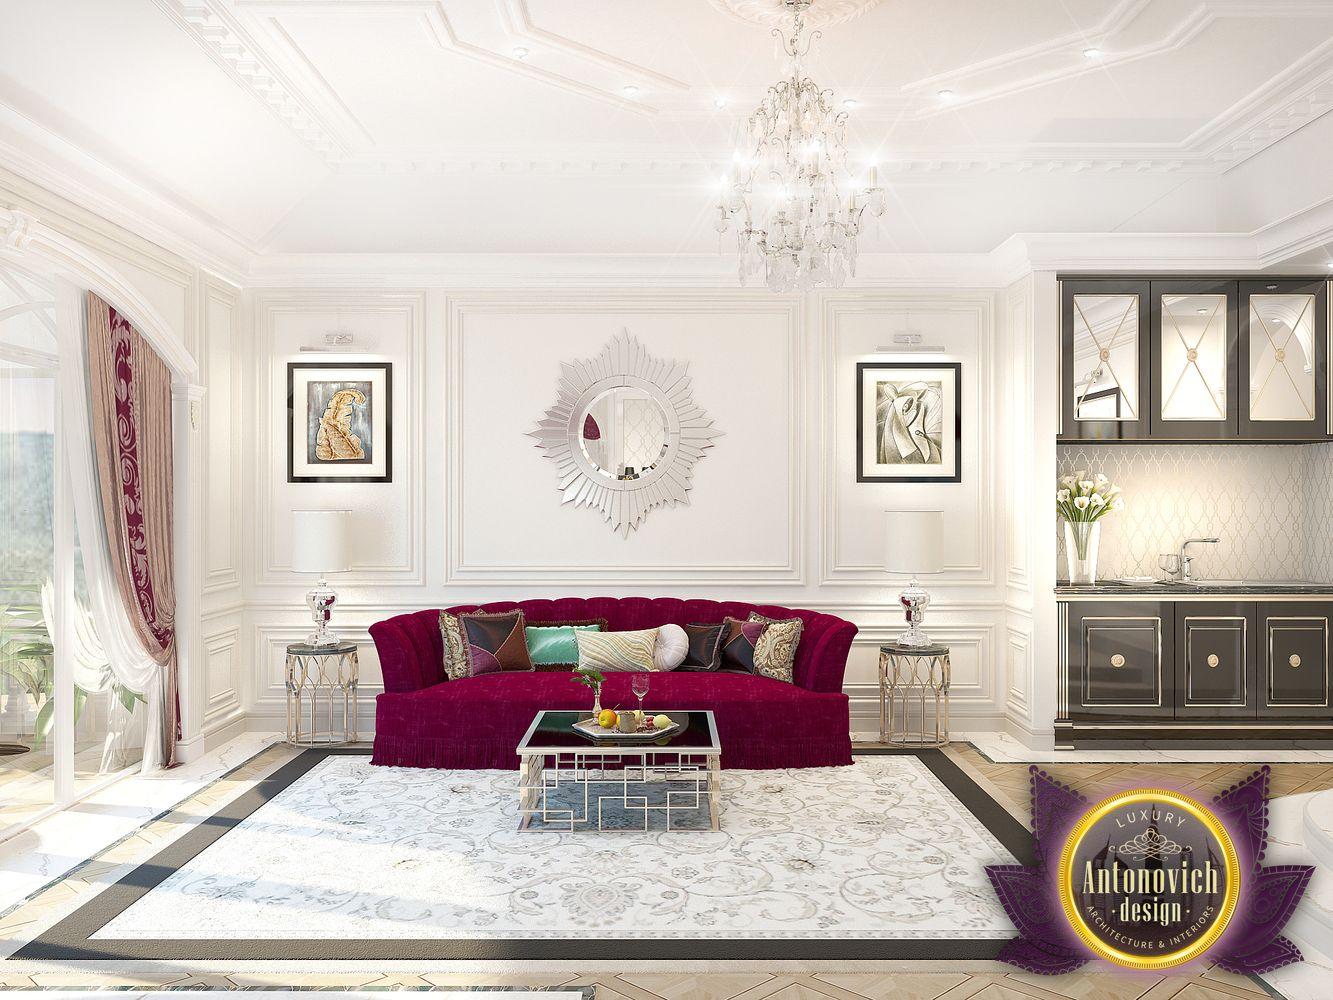 LUXURY ANTONOVICH DESIGN UAE: Living room decorating ideas by ...